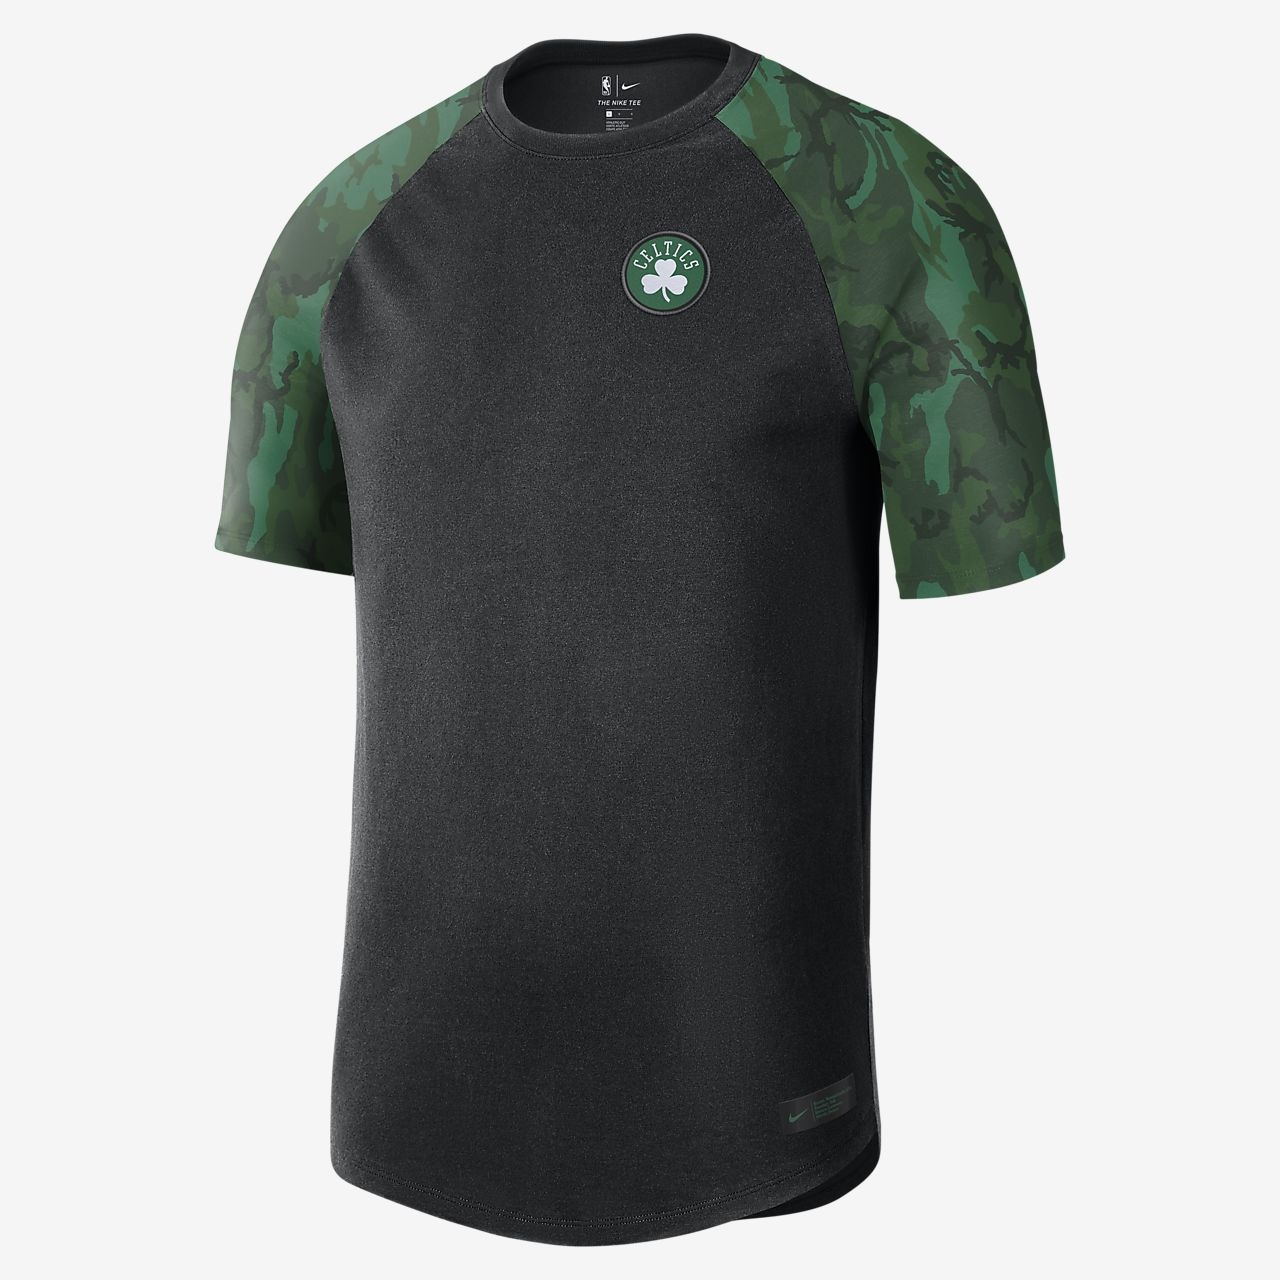 Boston Celtics Nike Men's Lightweight